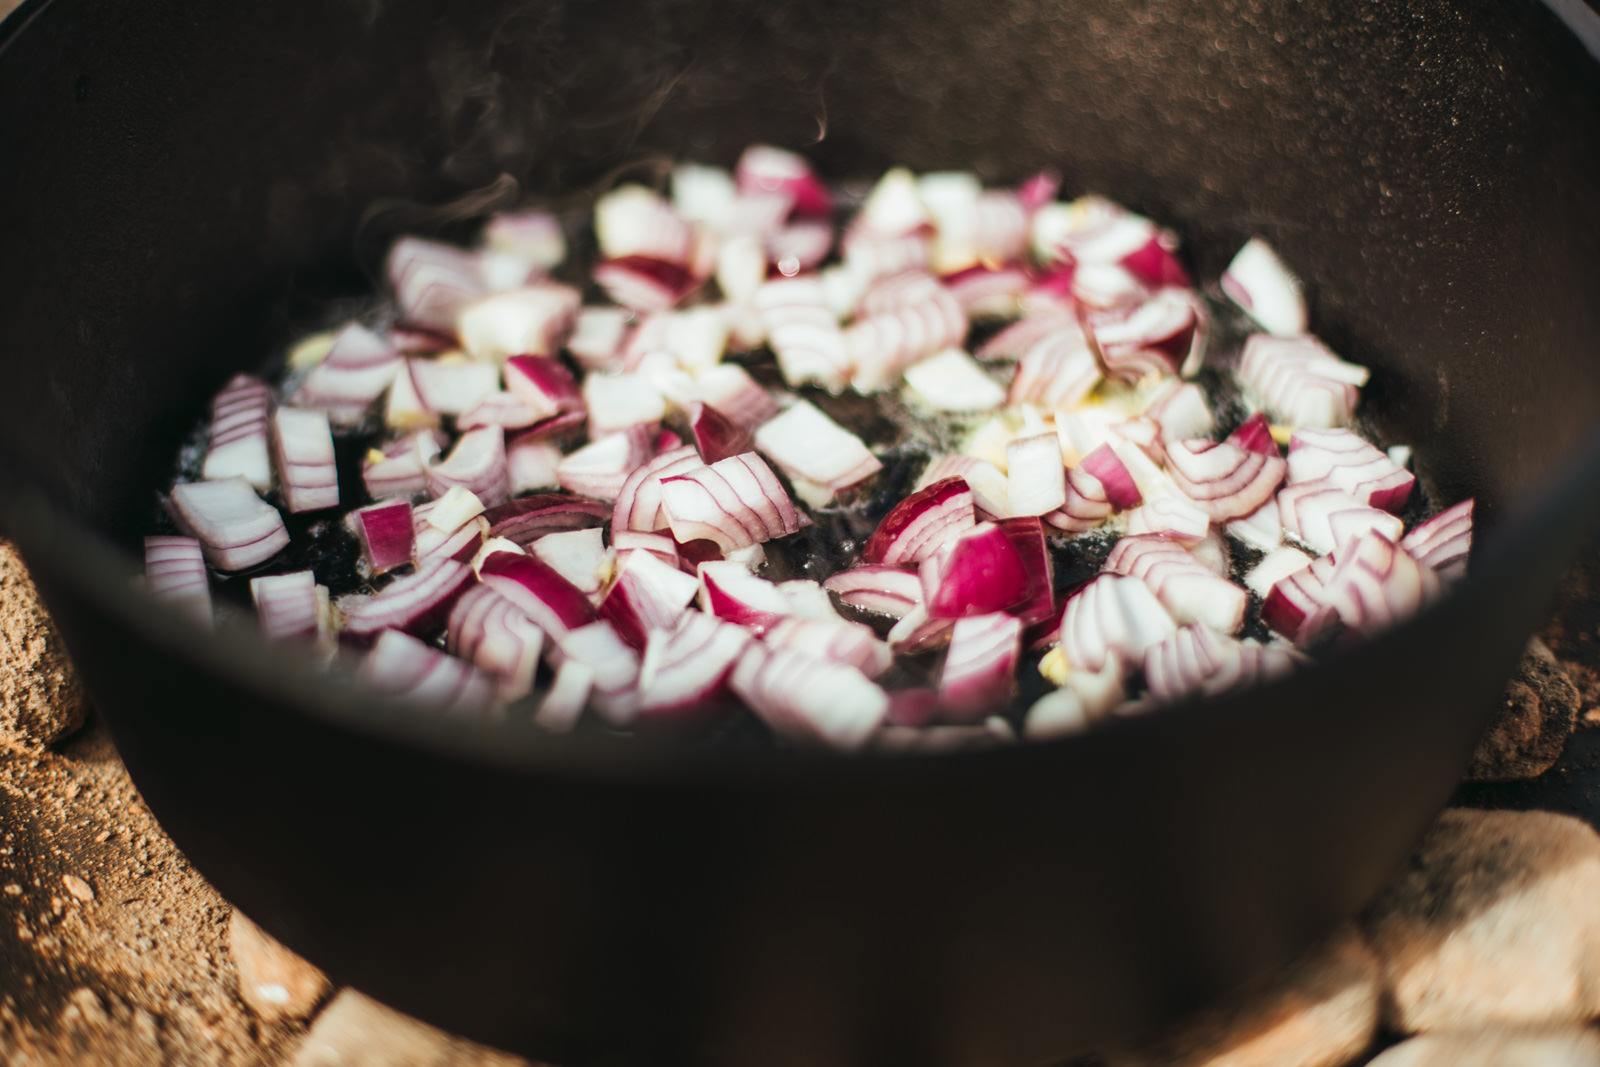 Zwiebeln braten in einem Gusseisernen Topf in Butter an.